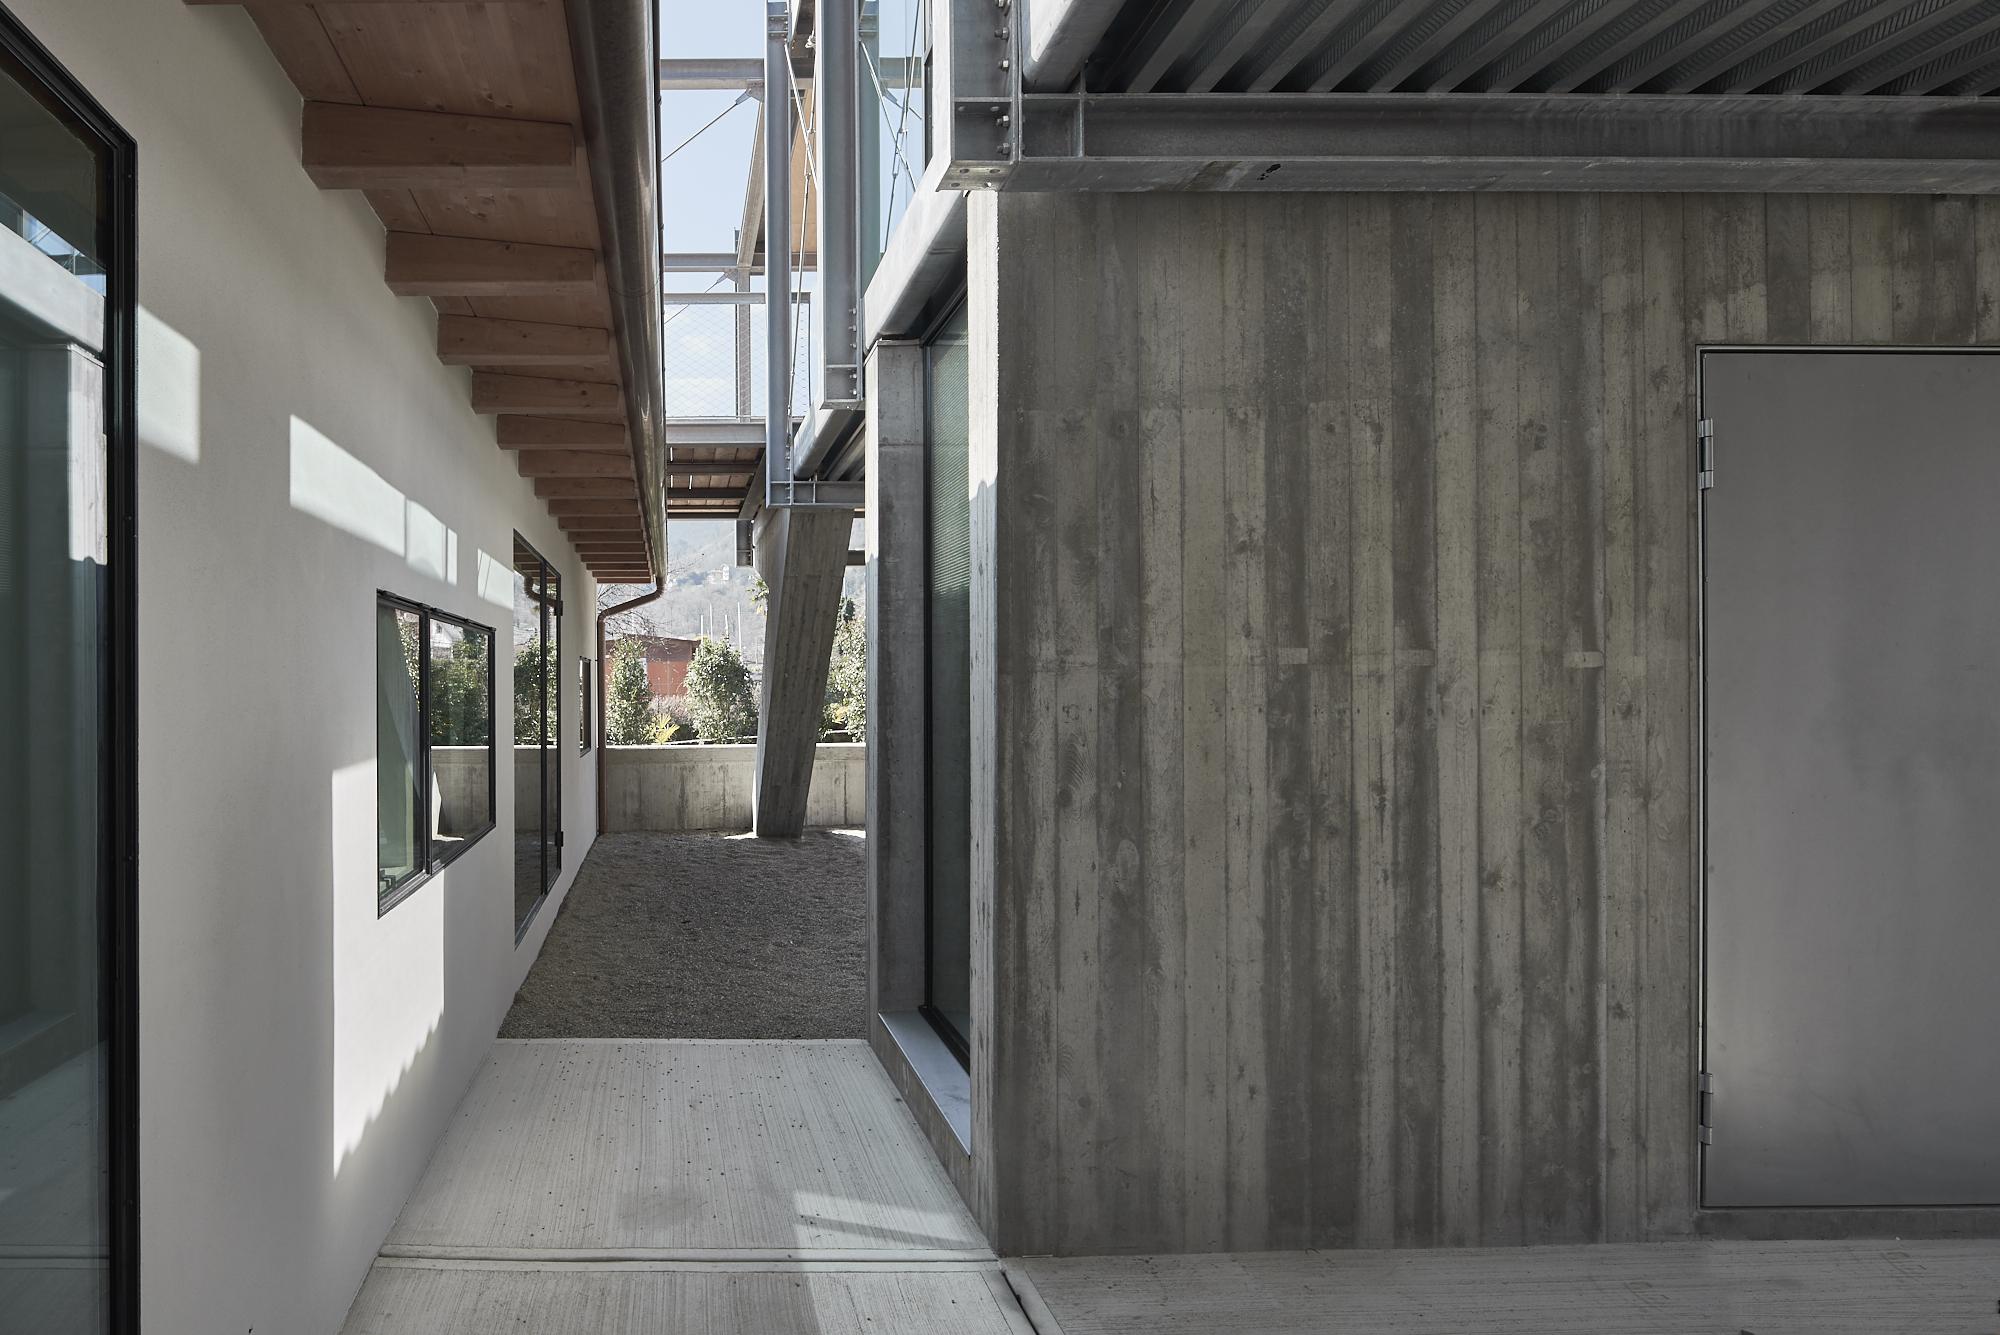 Umbau Villa am See Pella: Eingangsbereich